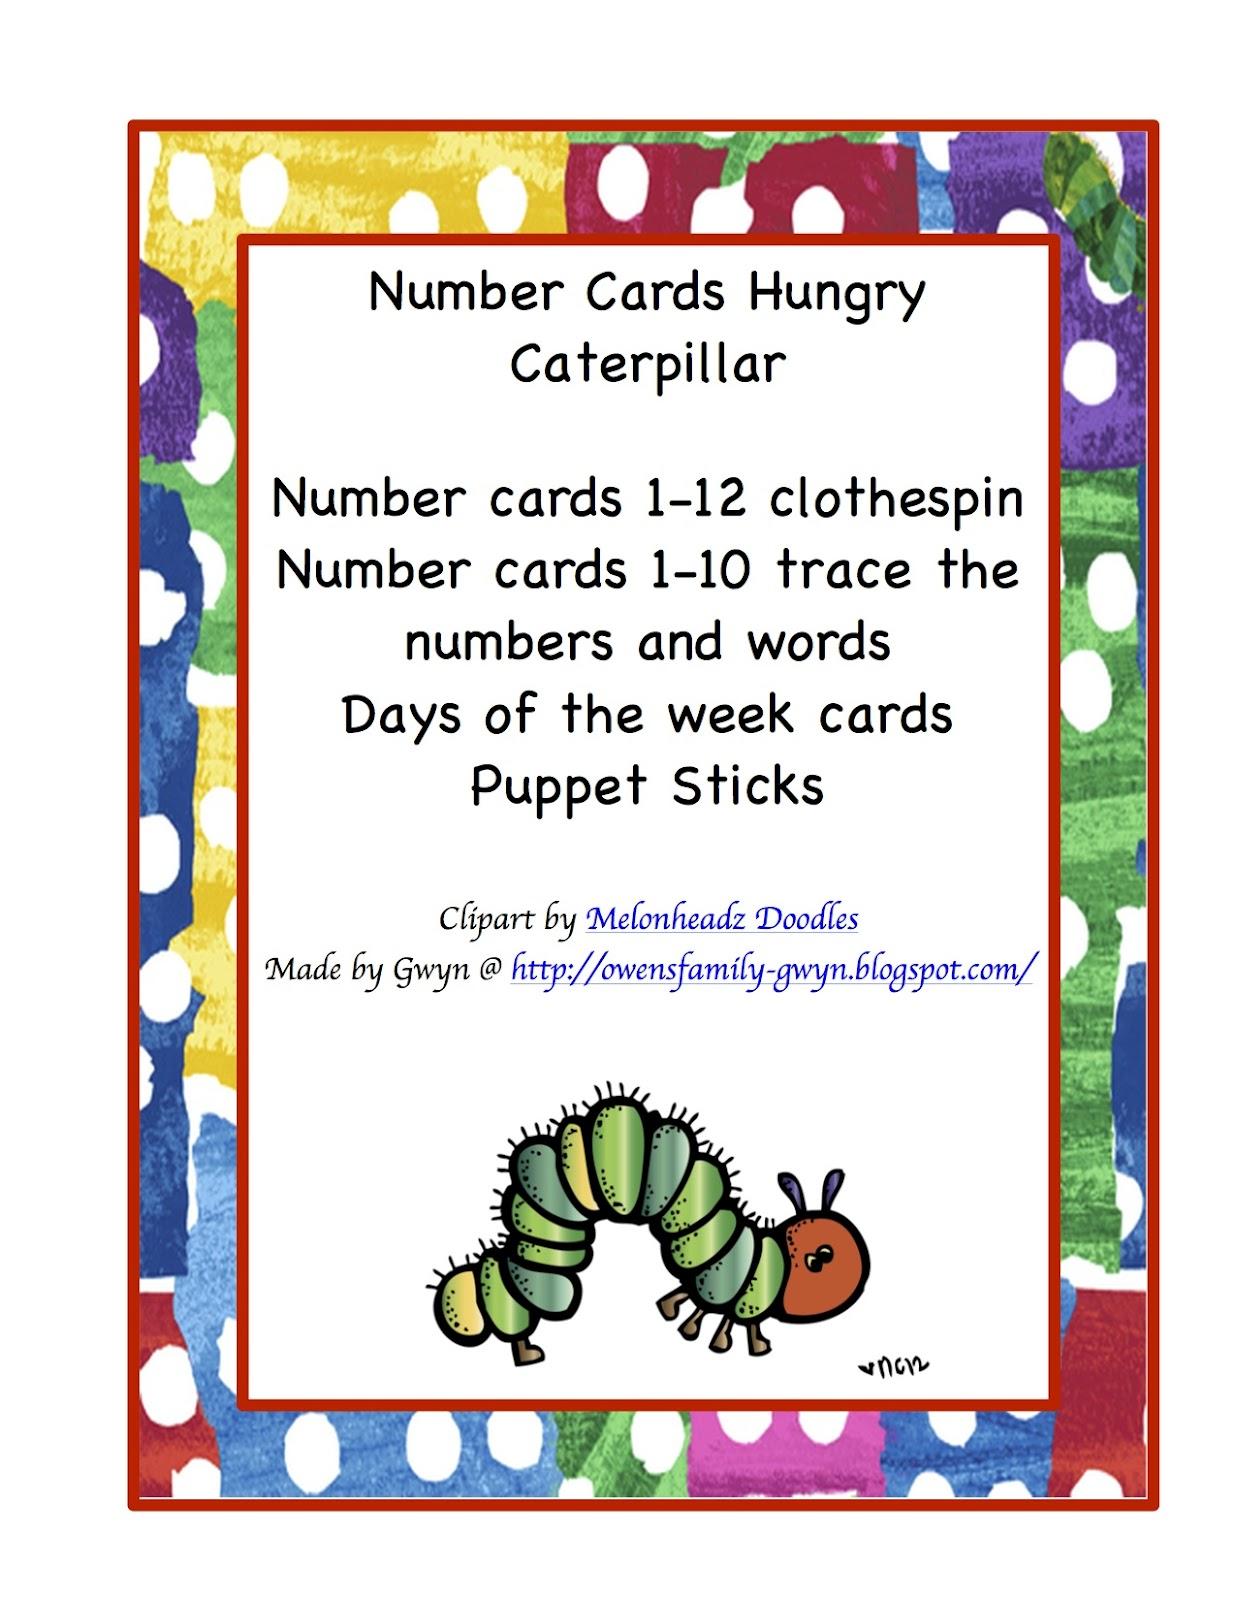 S Teacherspayteachers Product Preschool Bundle Hungry Caterpillar